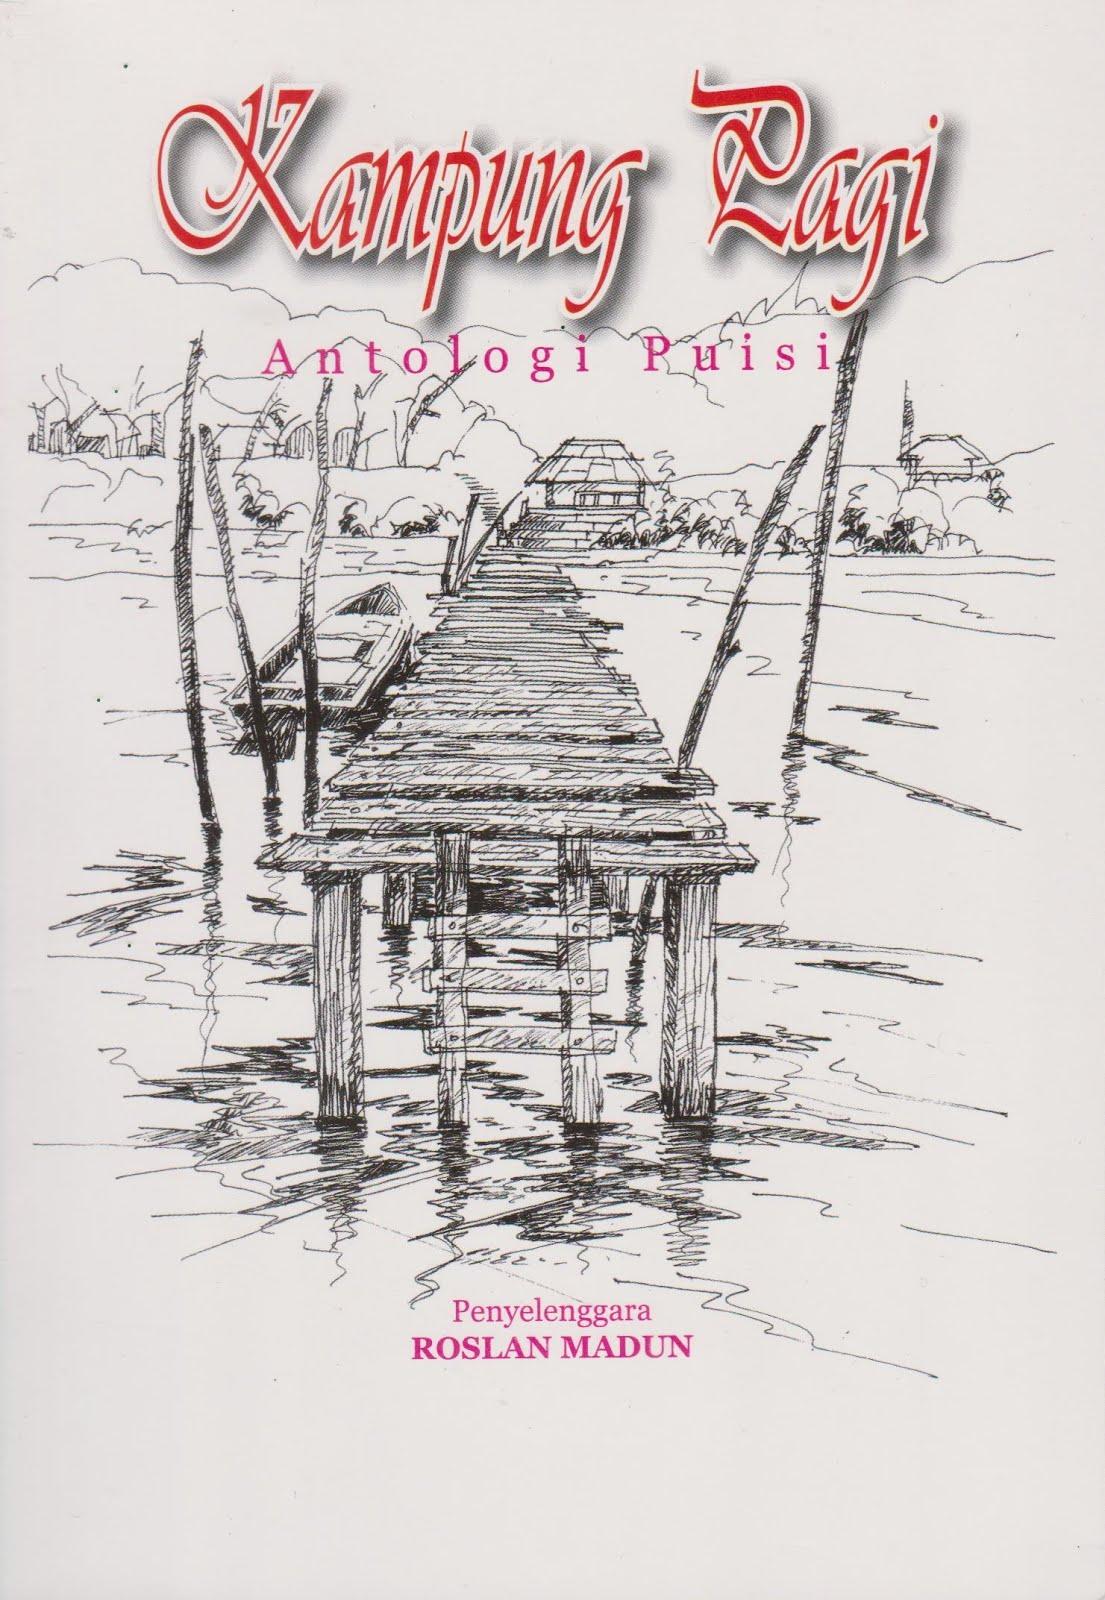 Antologi Puisi 'Kampung Pagi' bersama 29 orang penulis-penulis negeri Pahang.